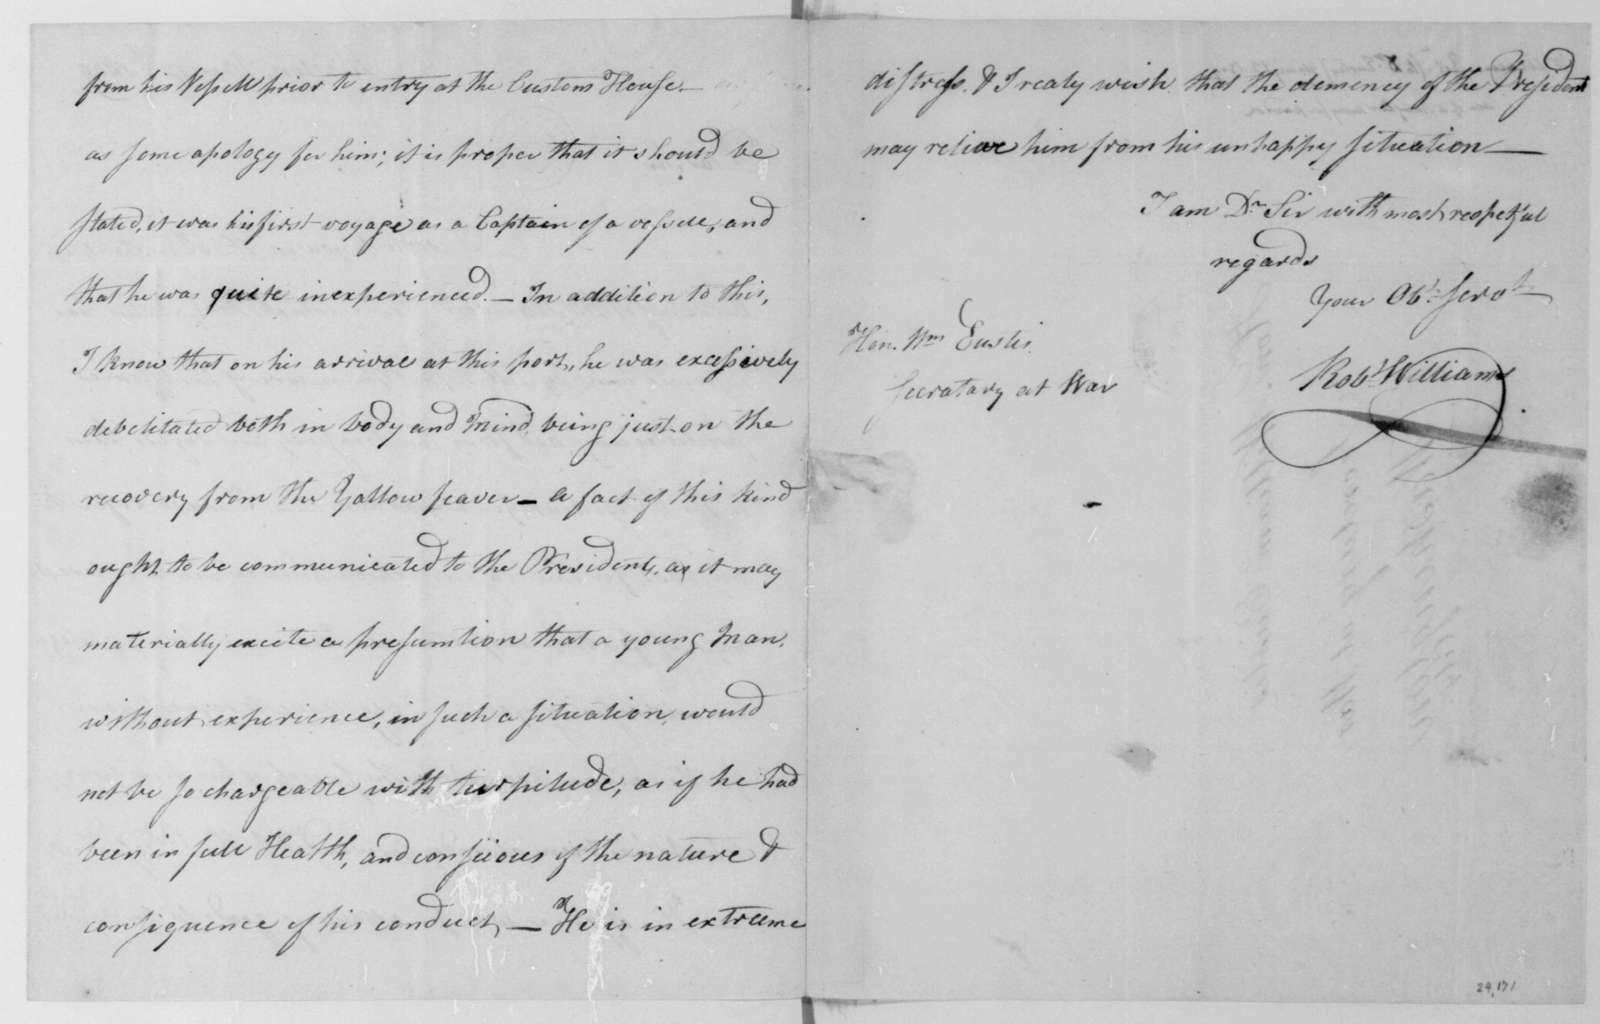 Robert Williams to William Eustis, May 12, 1809.